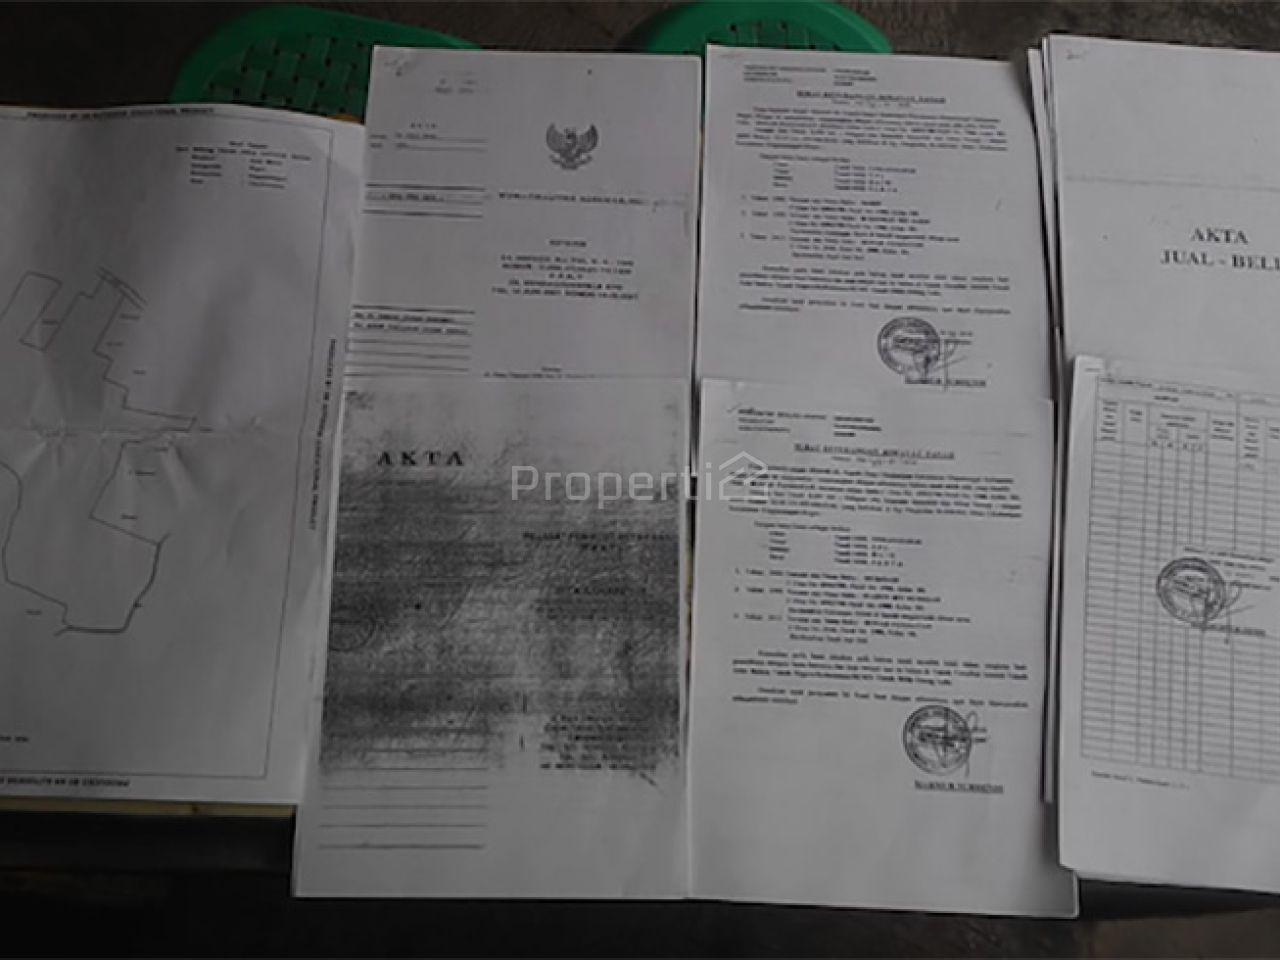 Tanah 5,6 Ha untuk Perumahan di Cileungsi, Cileungsi